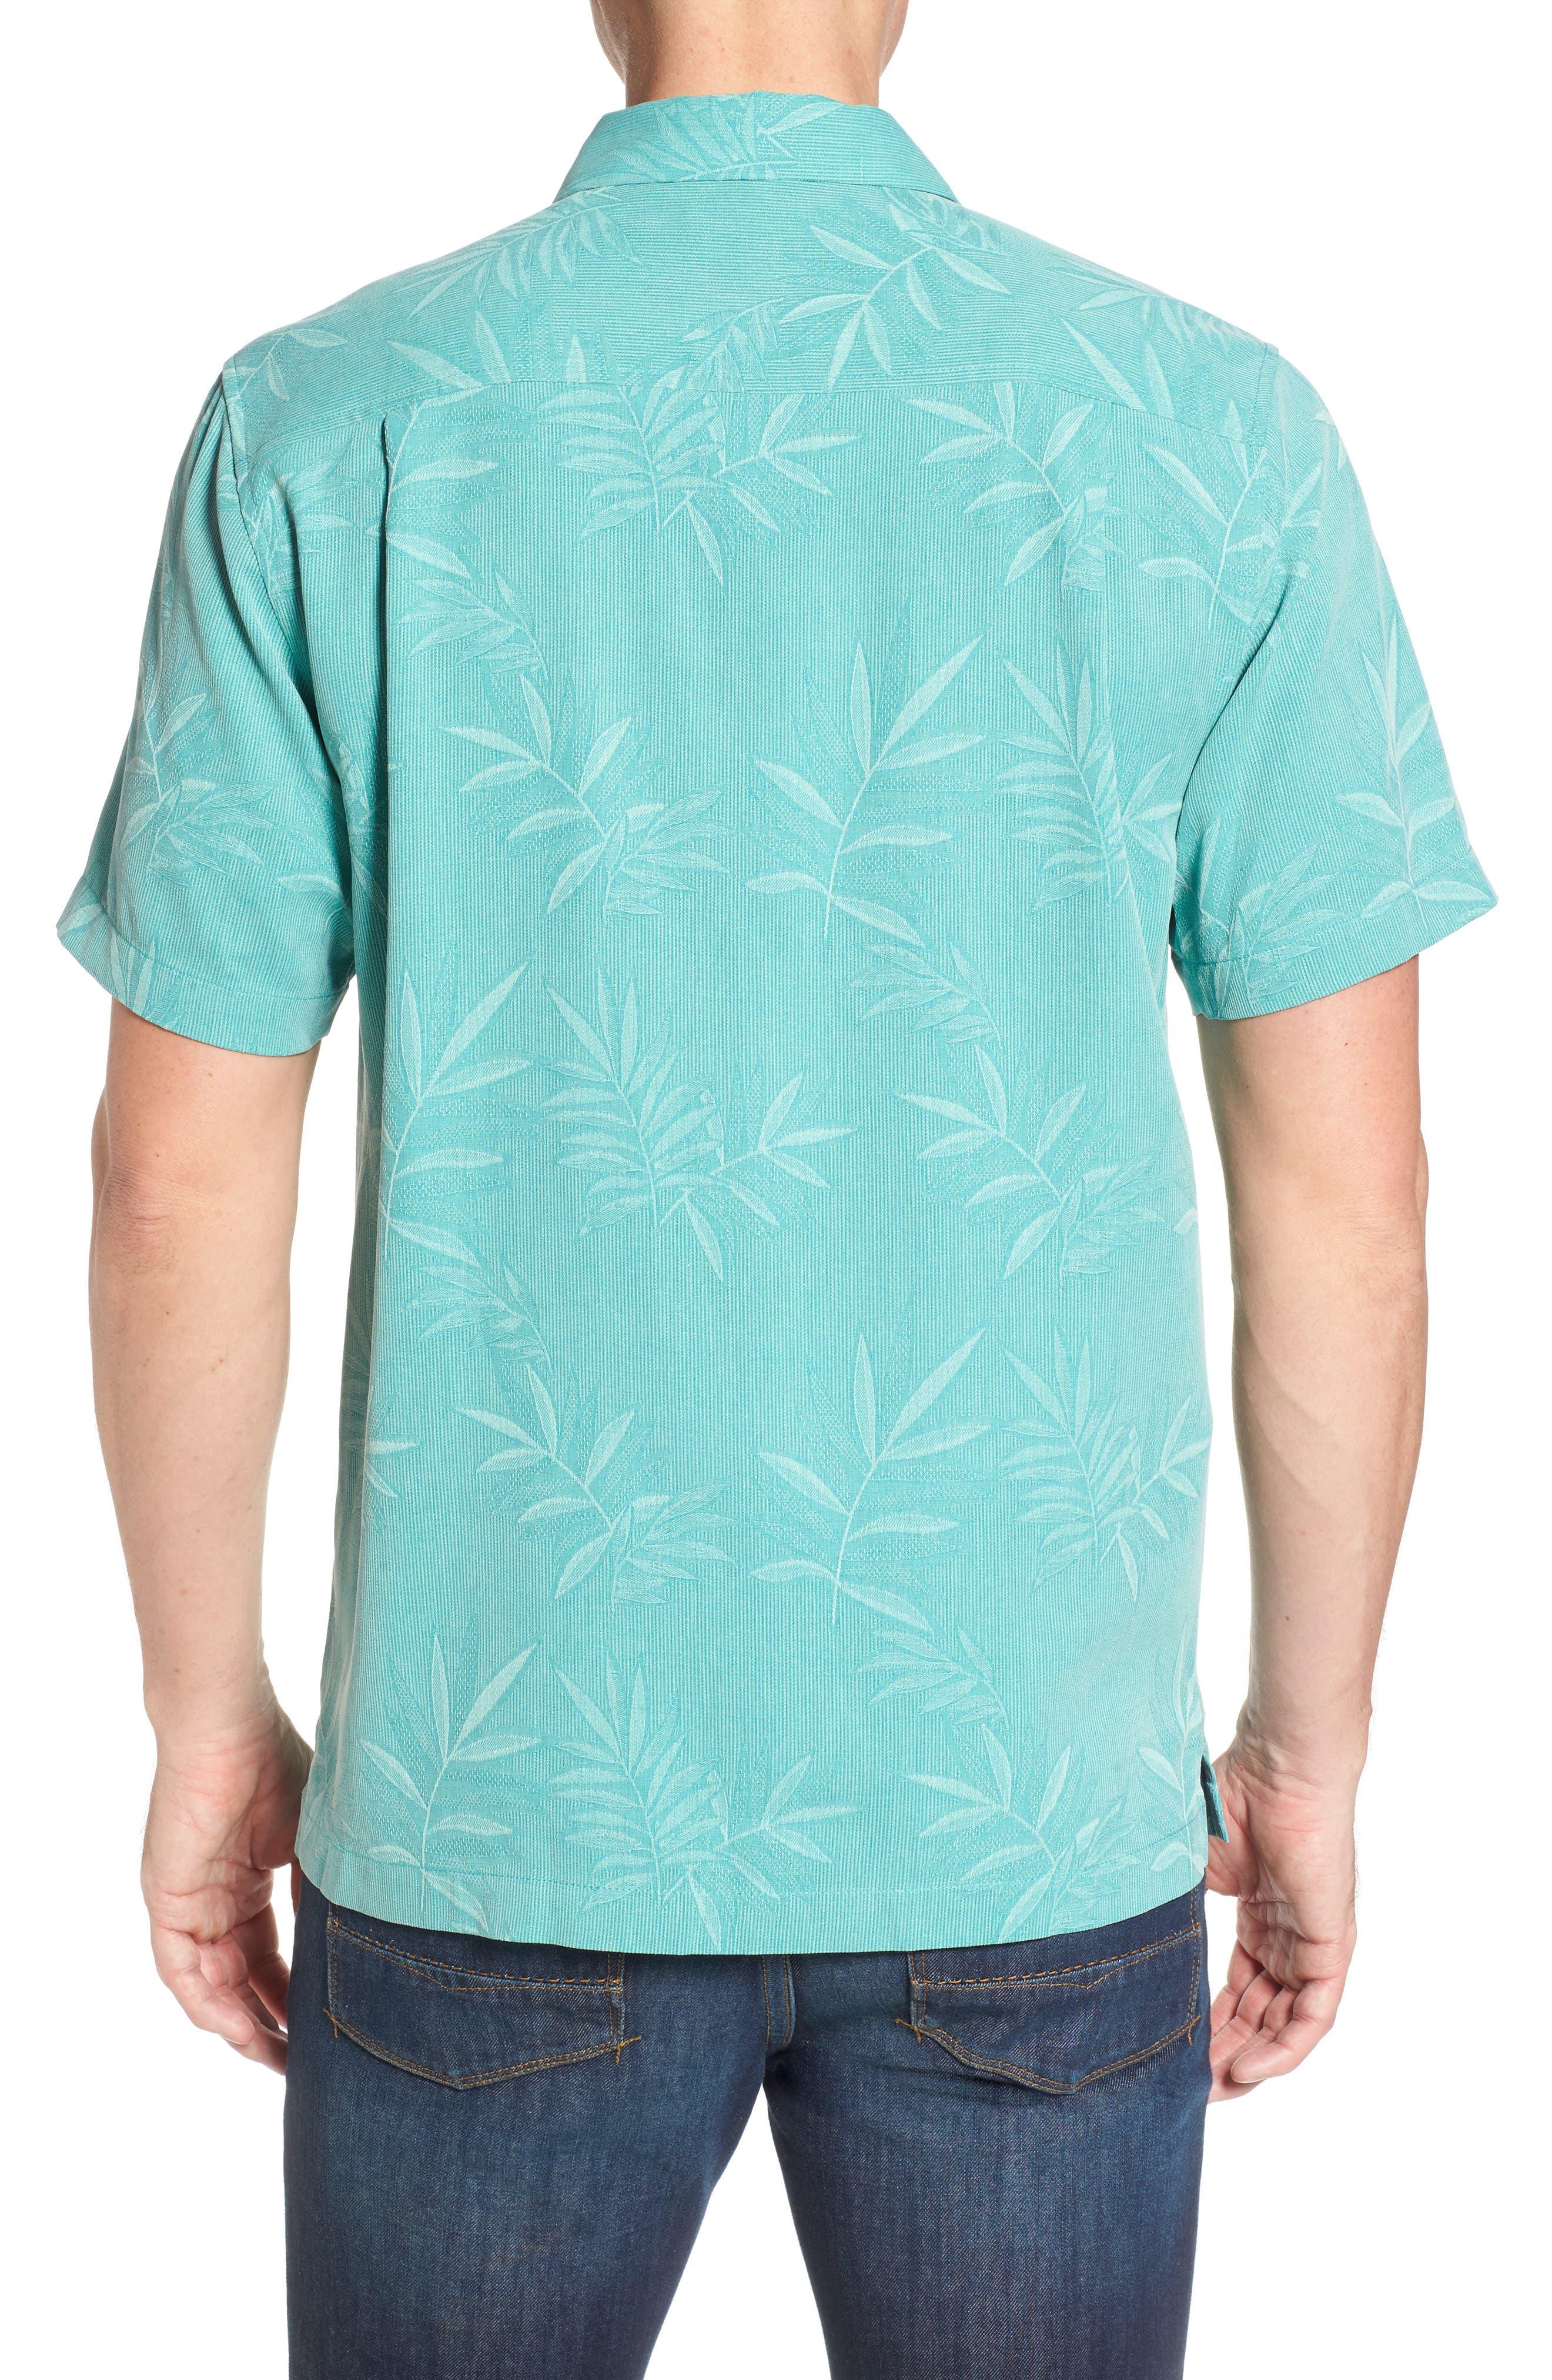 Alternate Image 2  - Tommy Bahama Luau Floral Silk Shirt